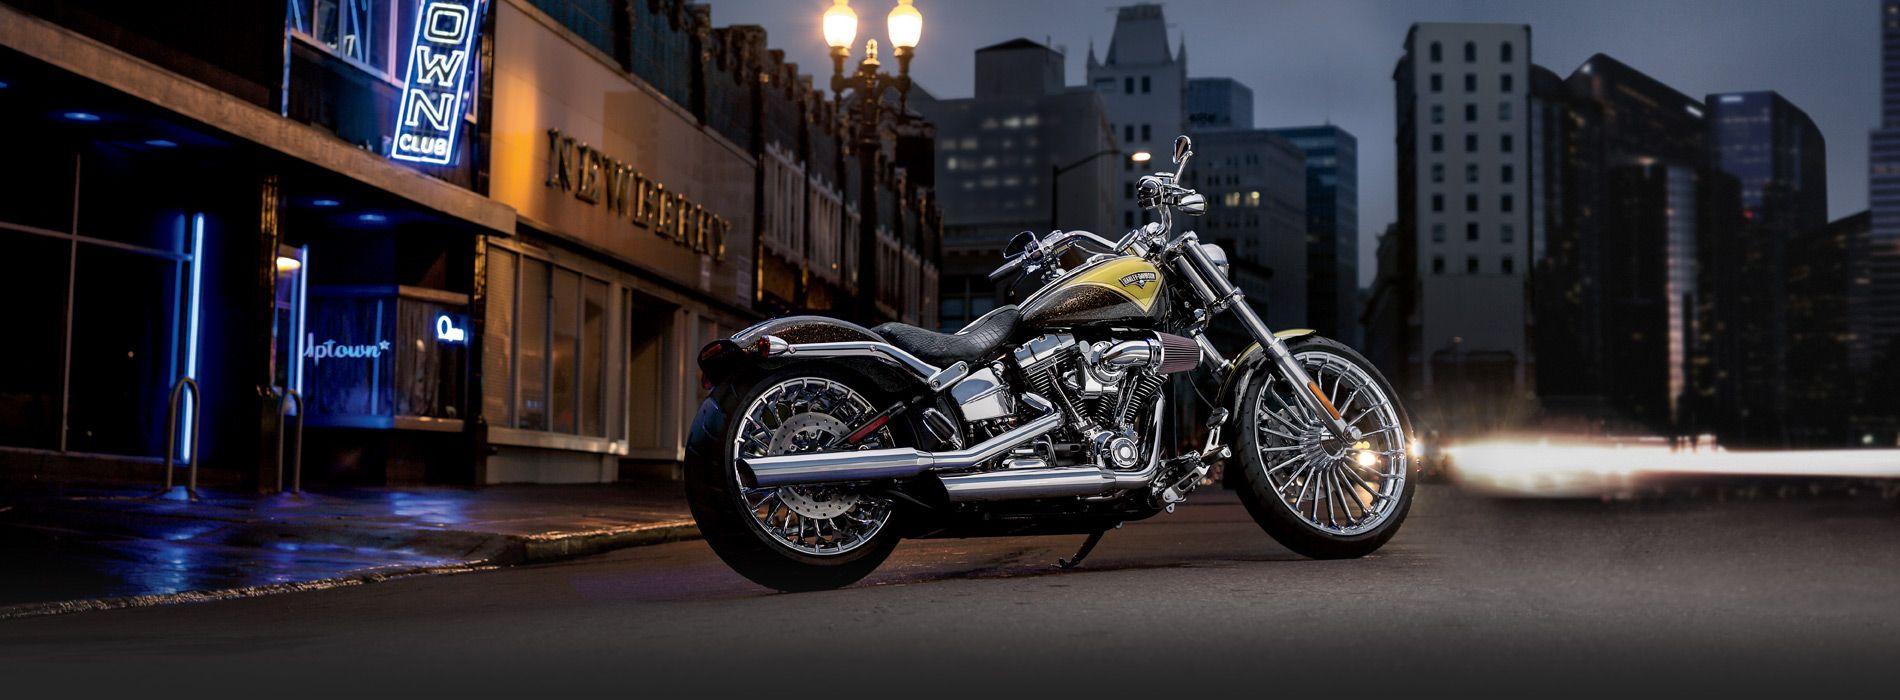 CVO™ Breakout™ Harley | Motorcycle Sport Custom | Harley-Davidson